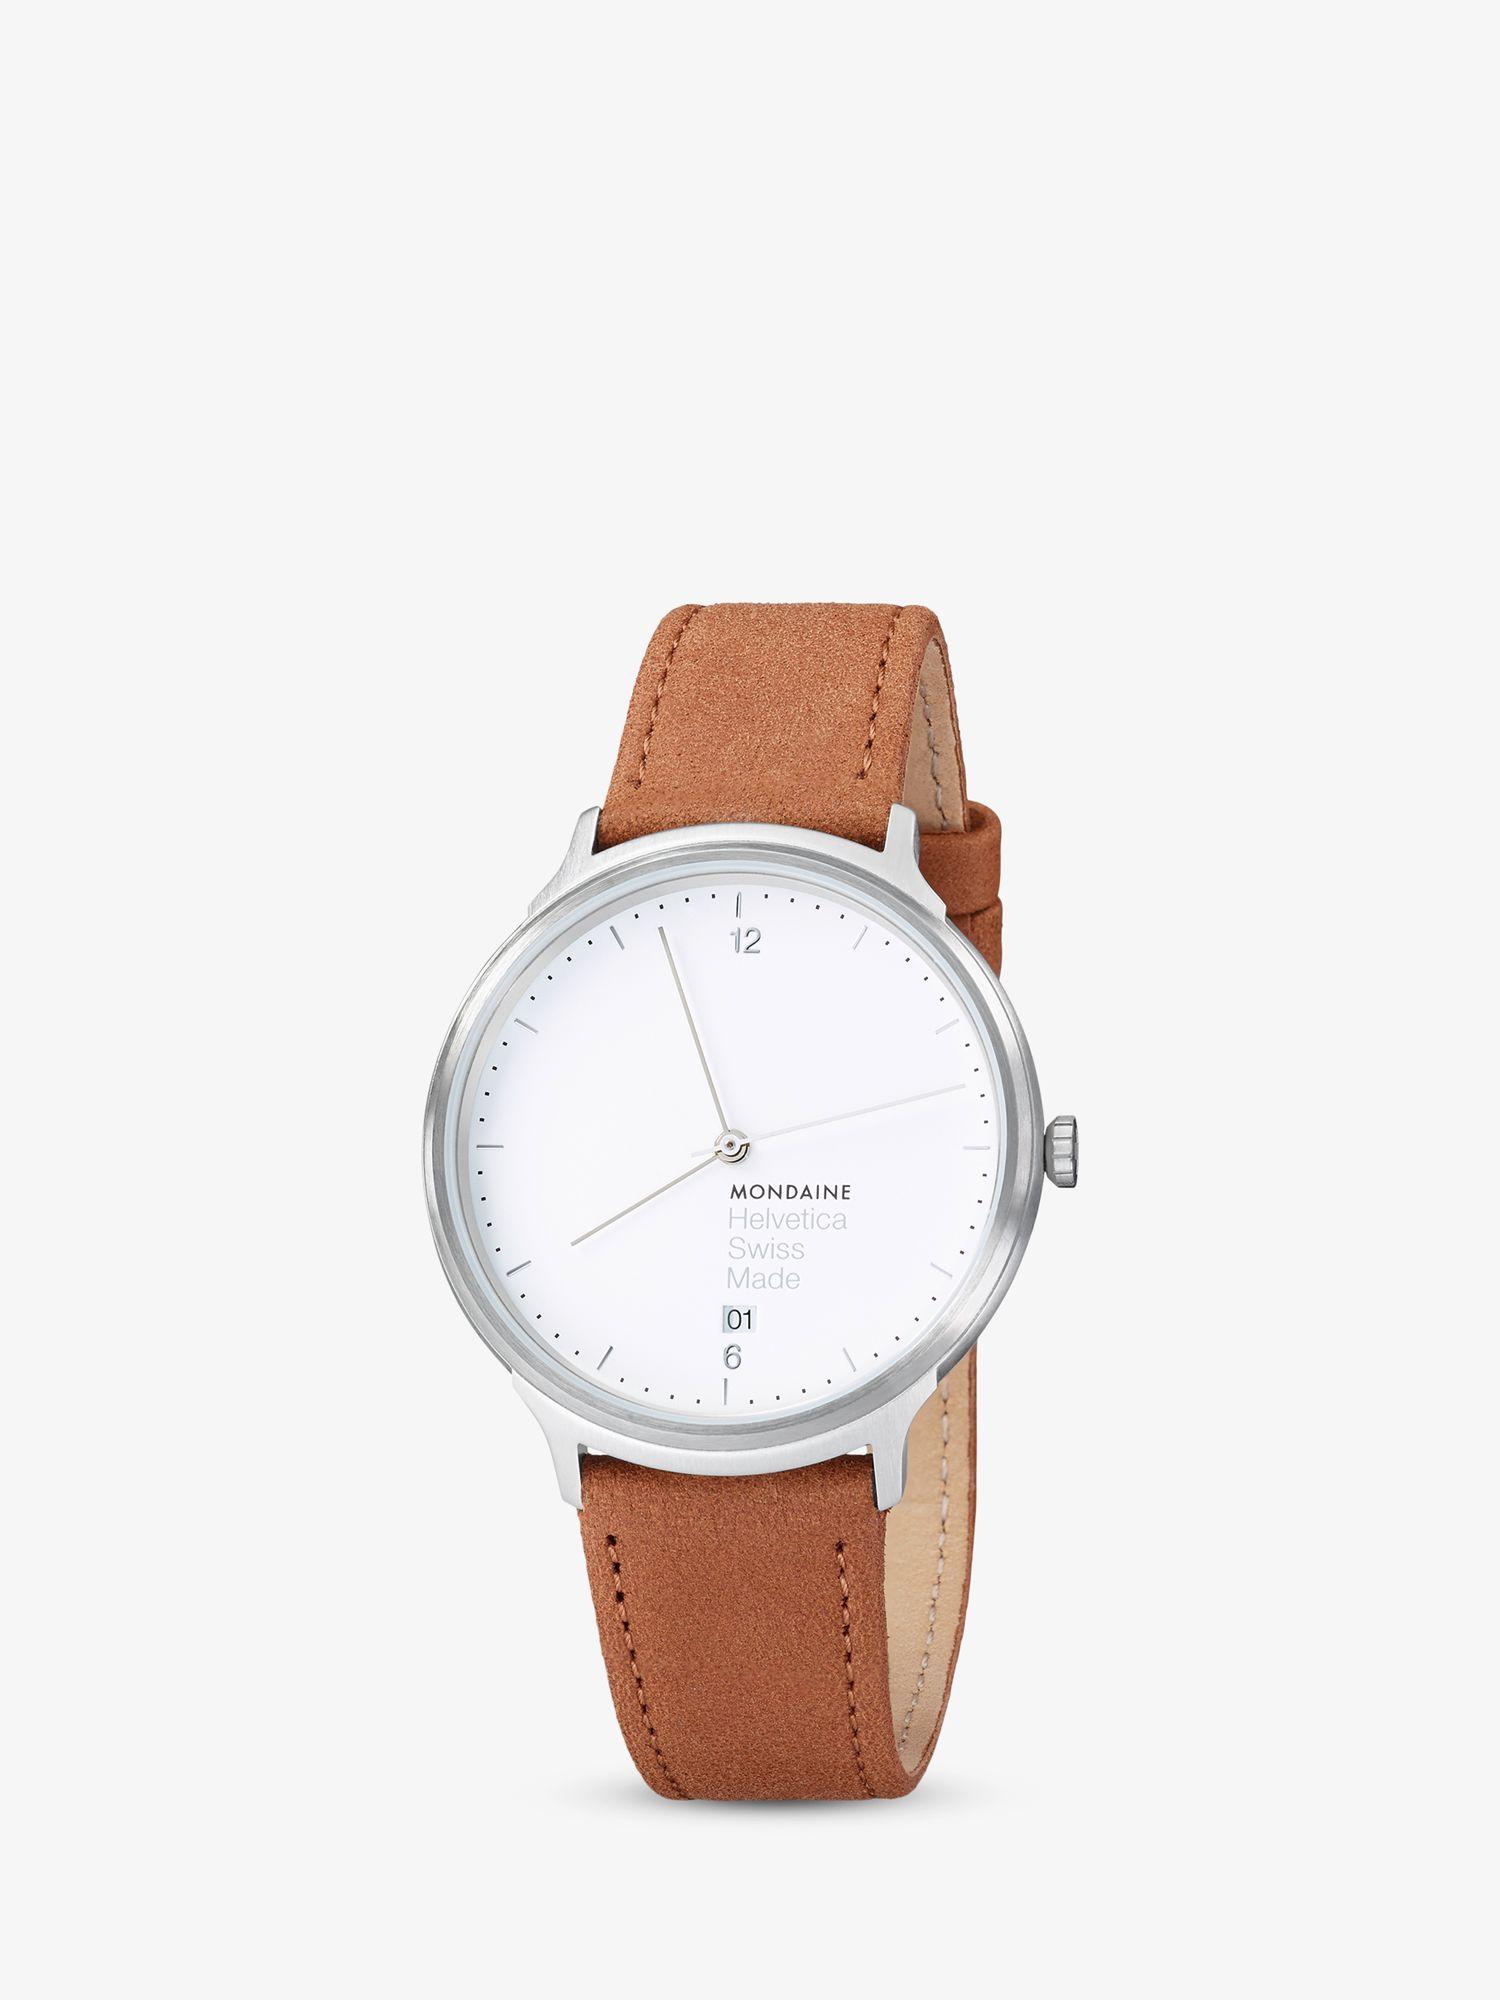 Mondaine Mondaine MH1L2210LG Unisex Helvetica Leather Strap Watch, Brown/White